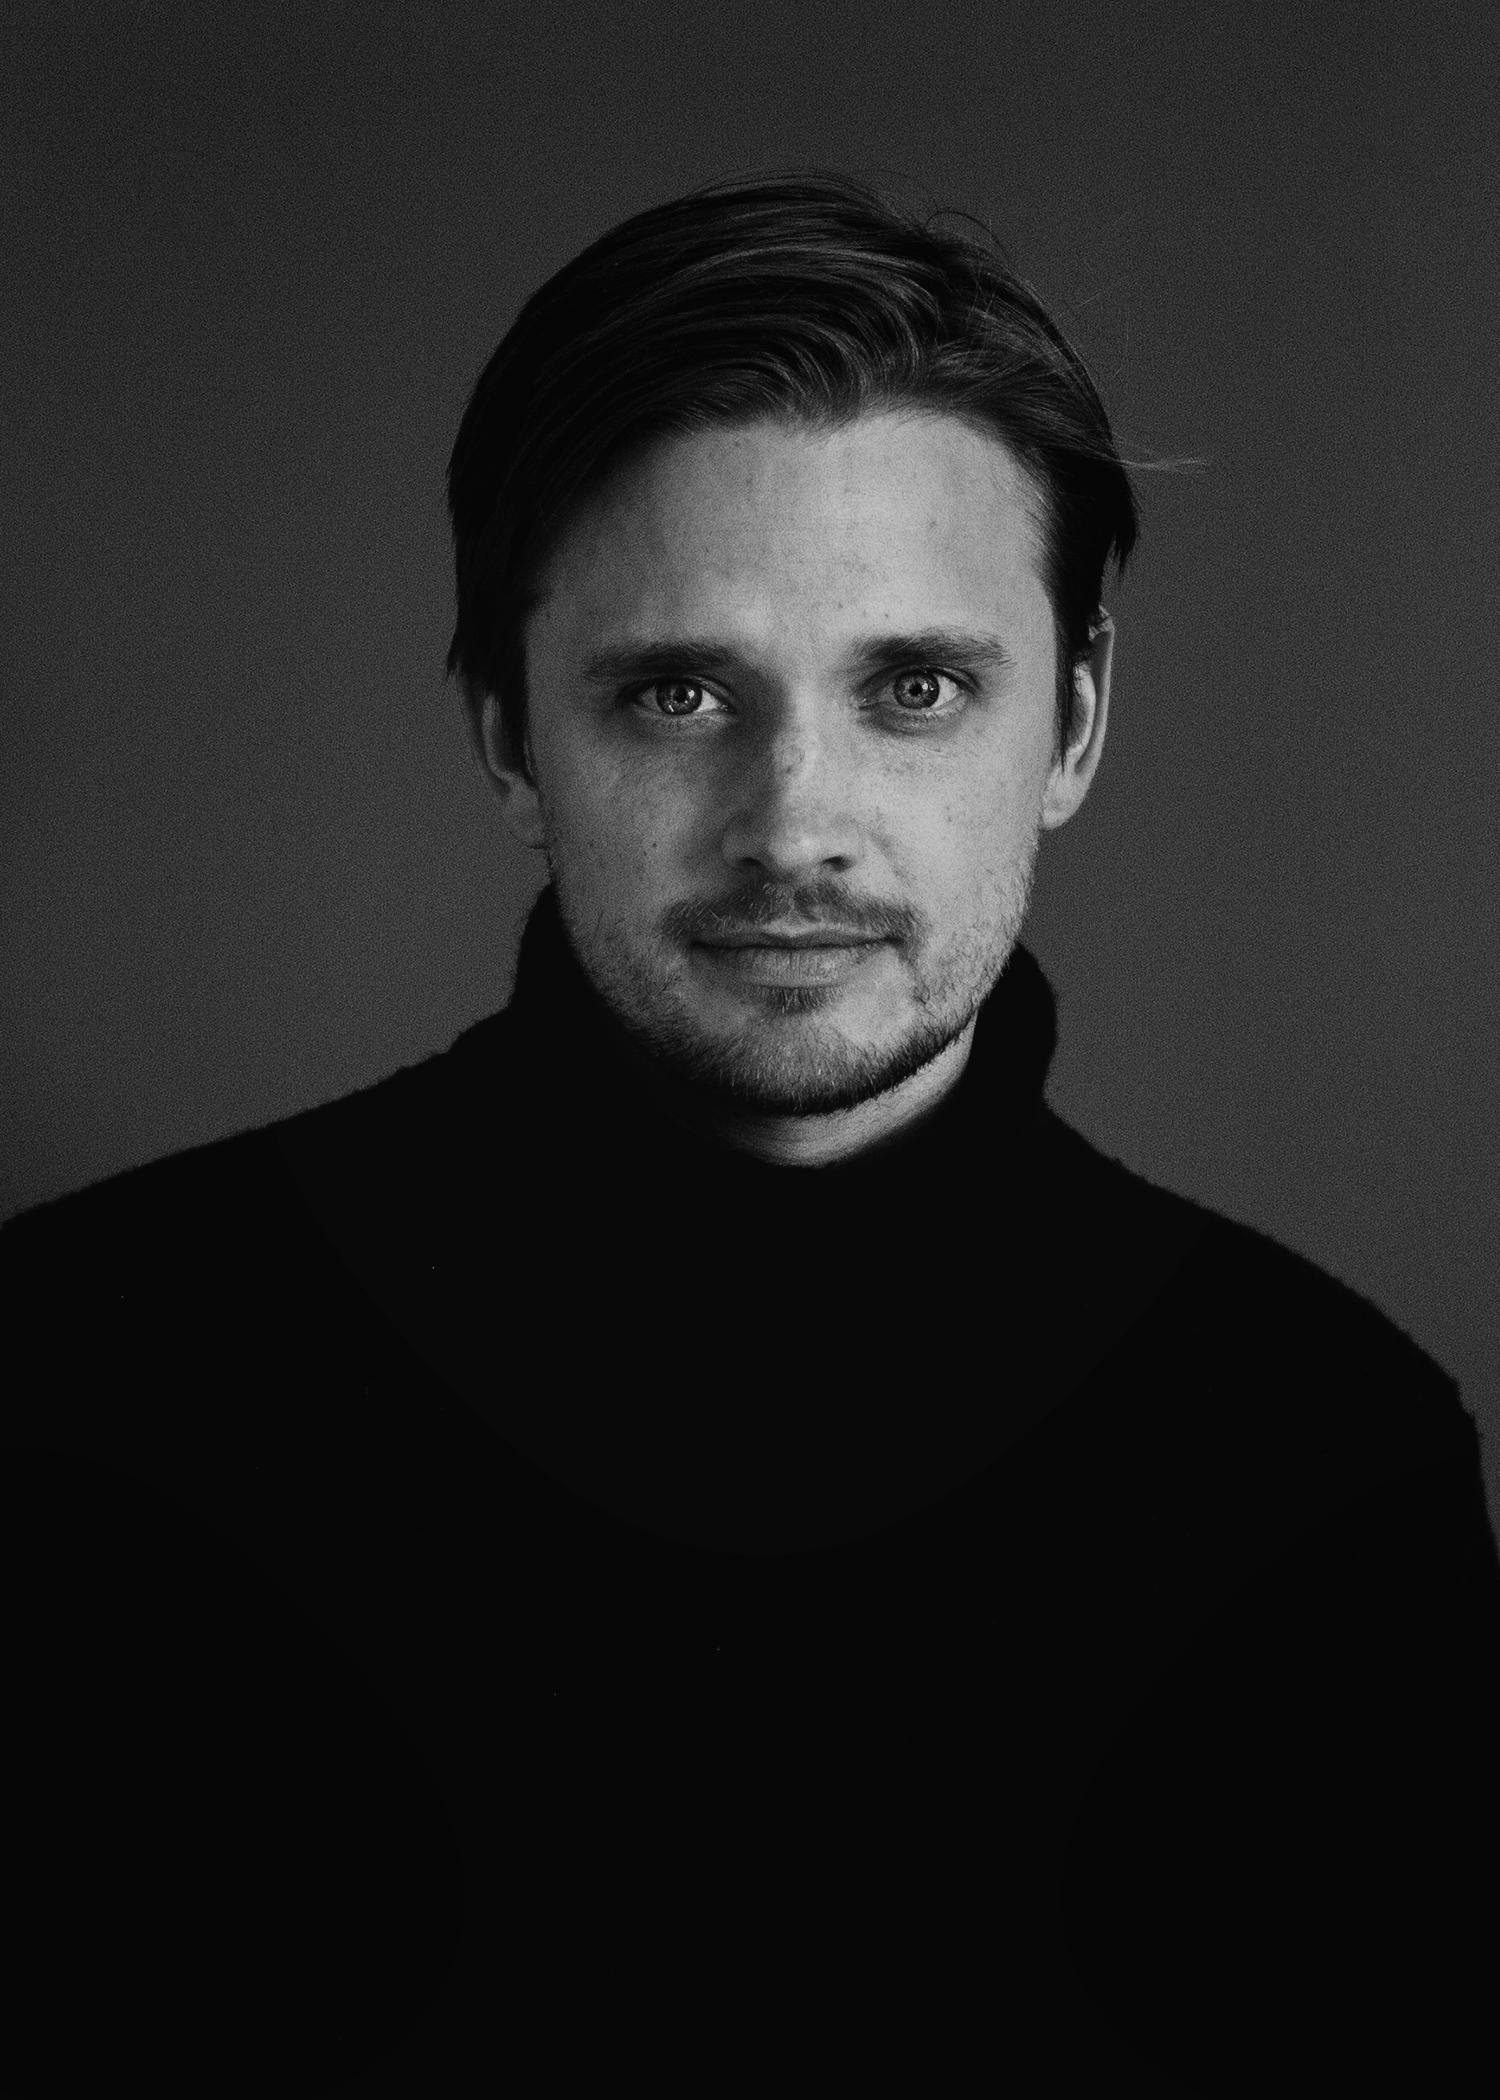 Rory Kennett-Lister, Creative Director